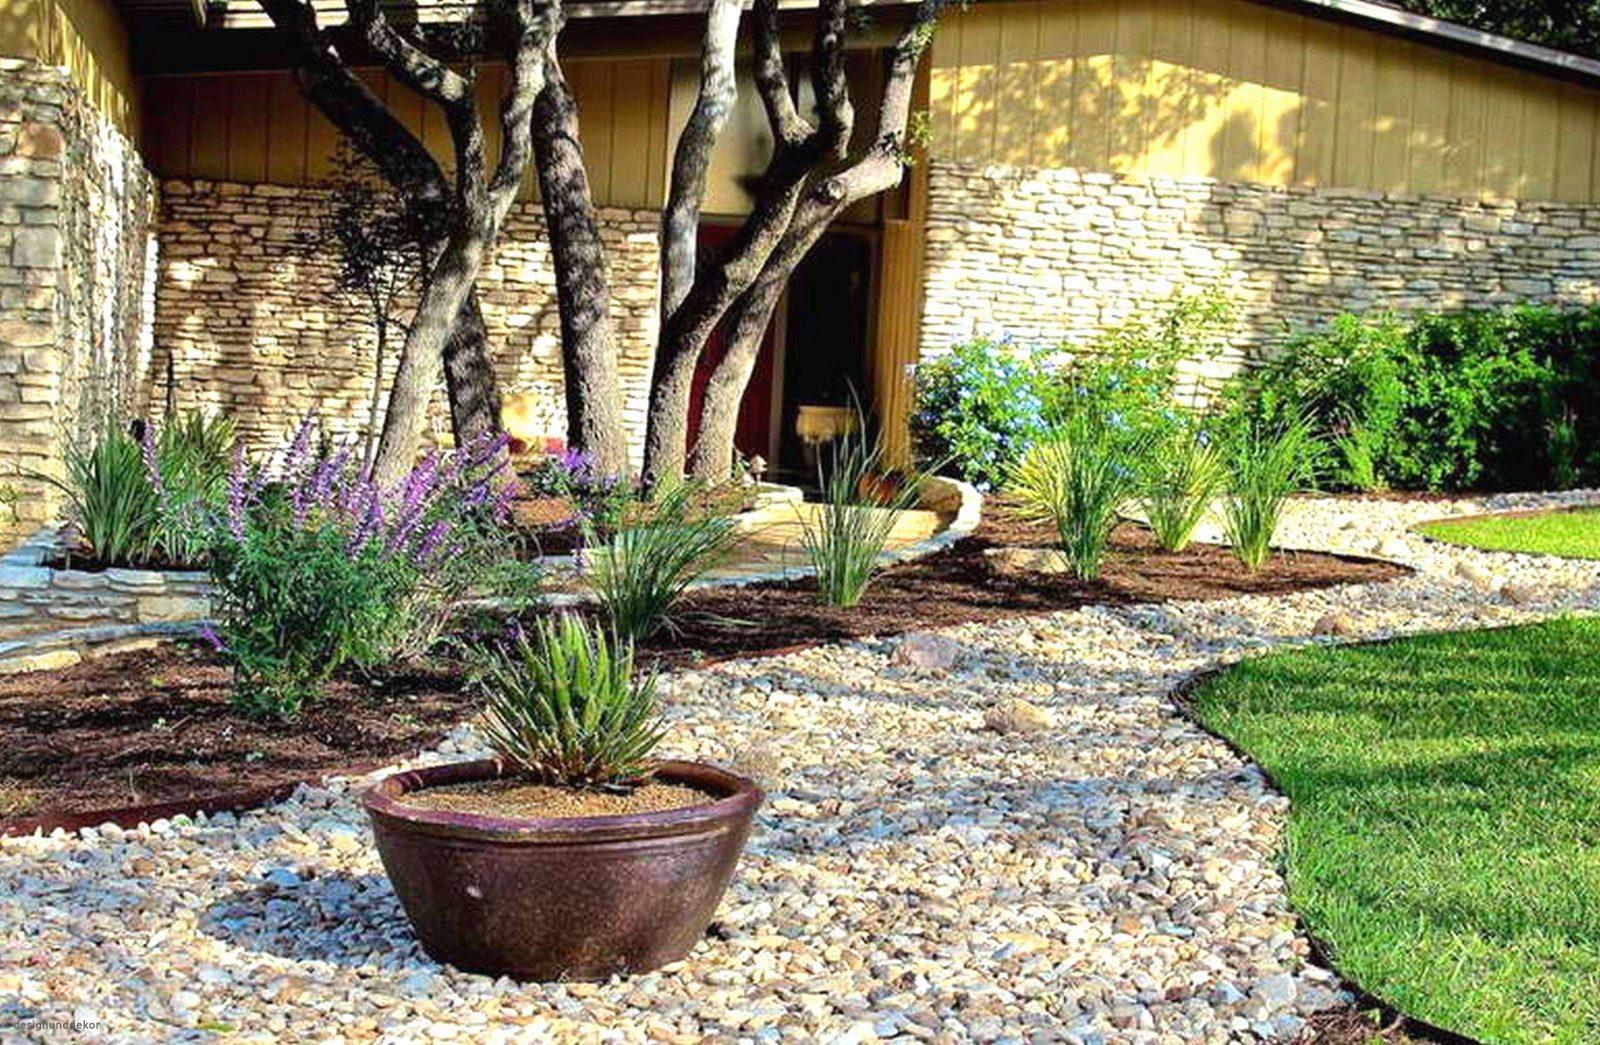 Gartengestaltung Hanglage Elegant Gartengestaltung Hanglage Modern von Gartengestaltung Mit Steinen Am Hang Bild